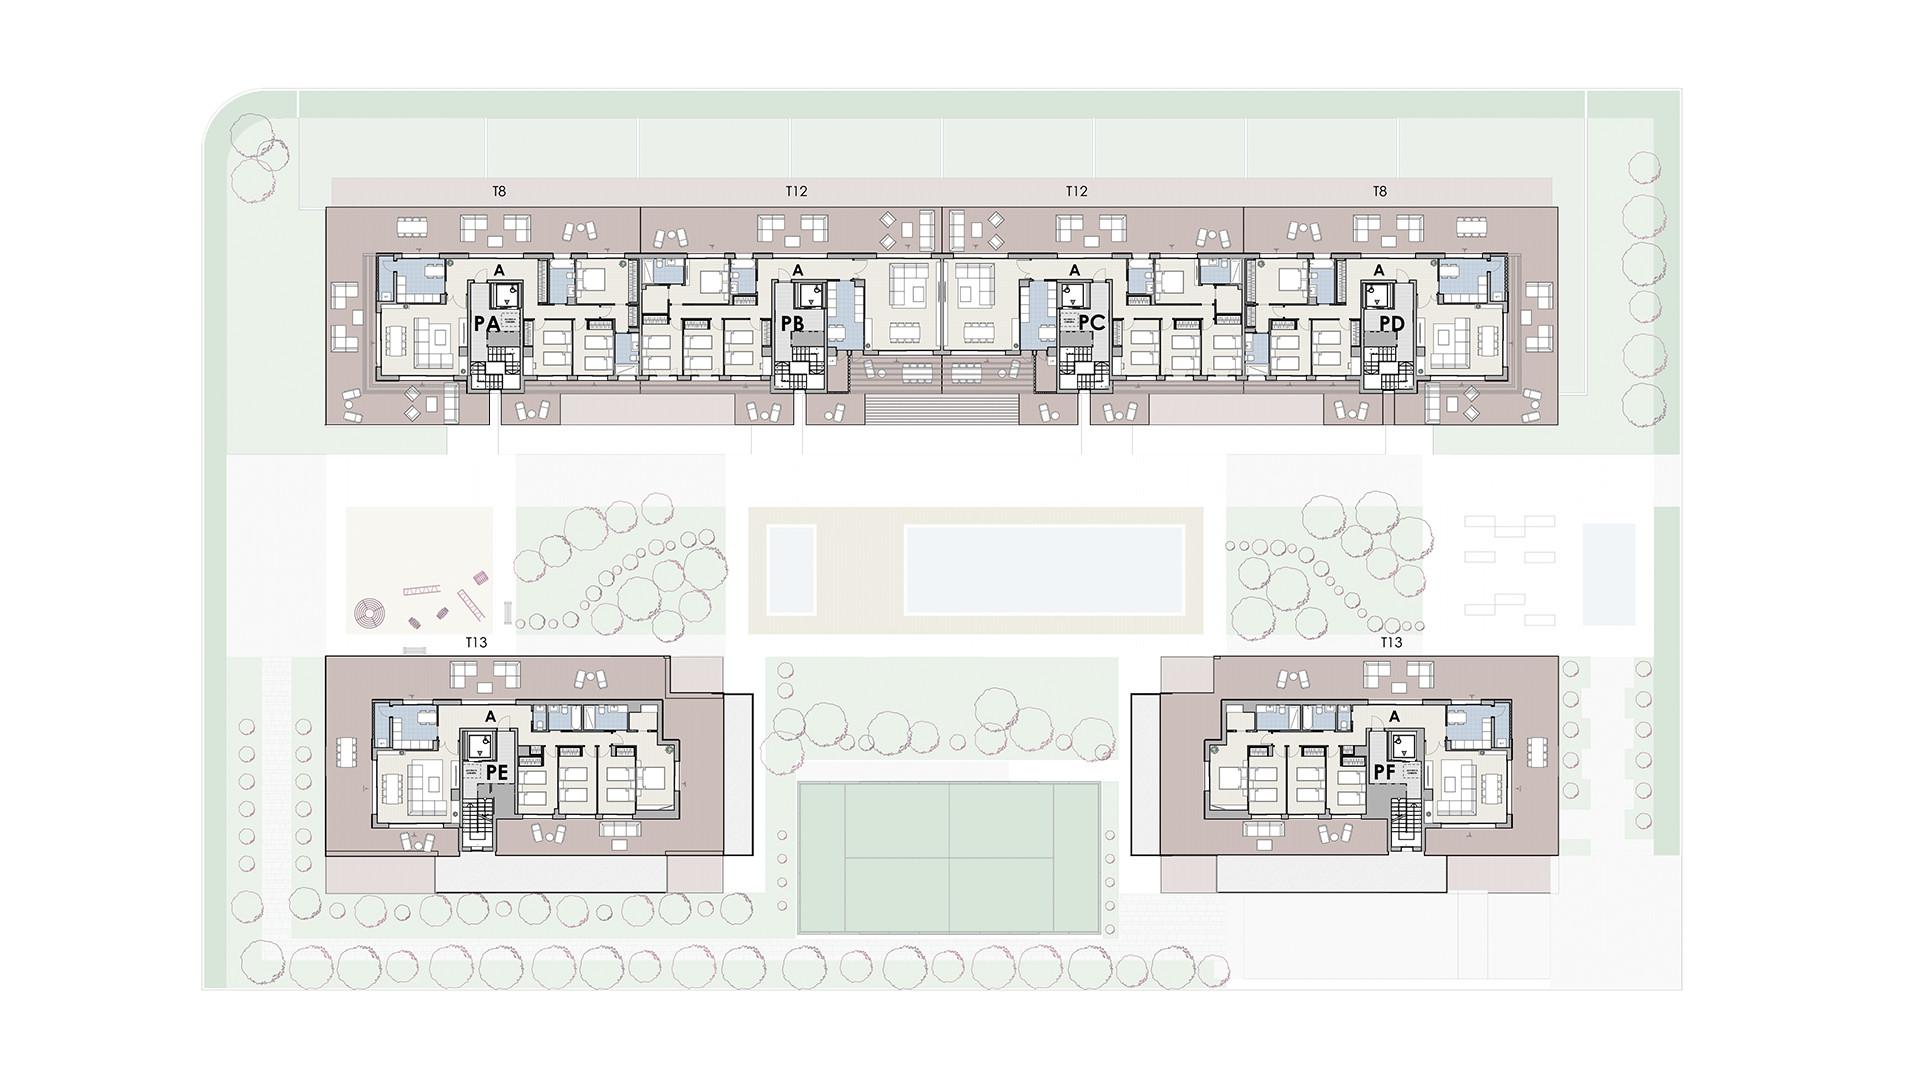 Isla de la toja pisos obra nueva en tempranales san sebastian - Pisos en san sebastian de los reyes obra nueva ...